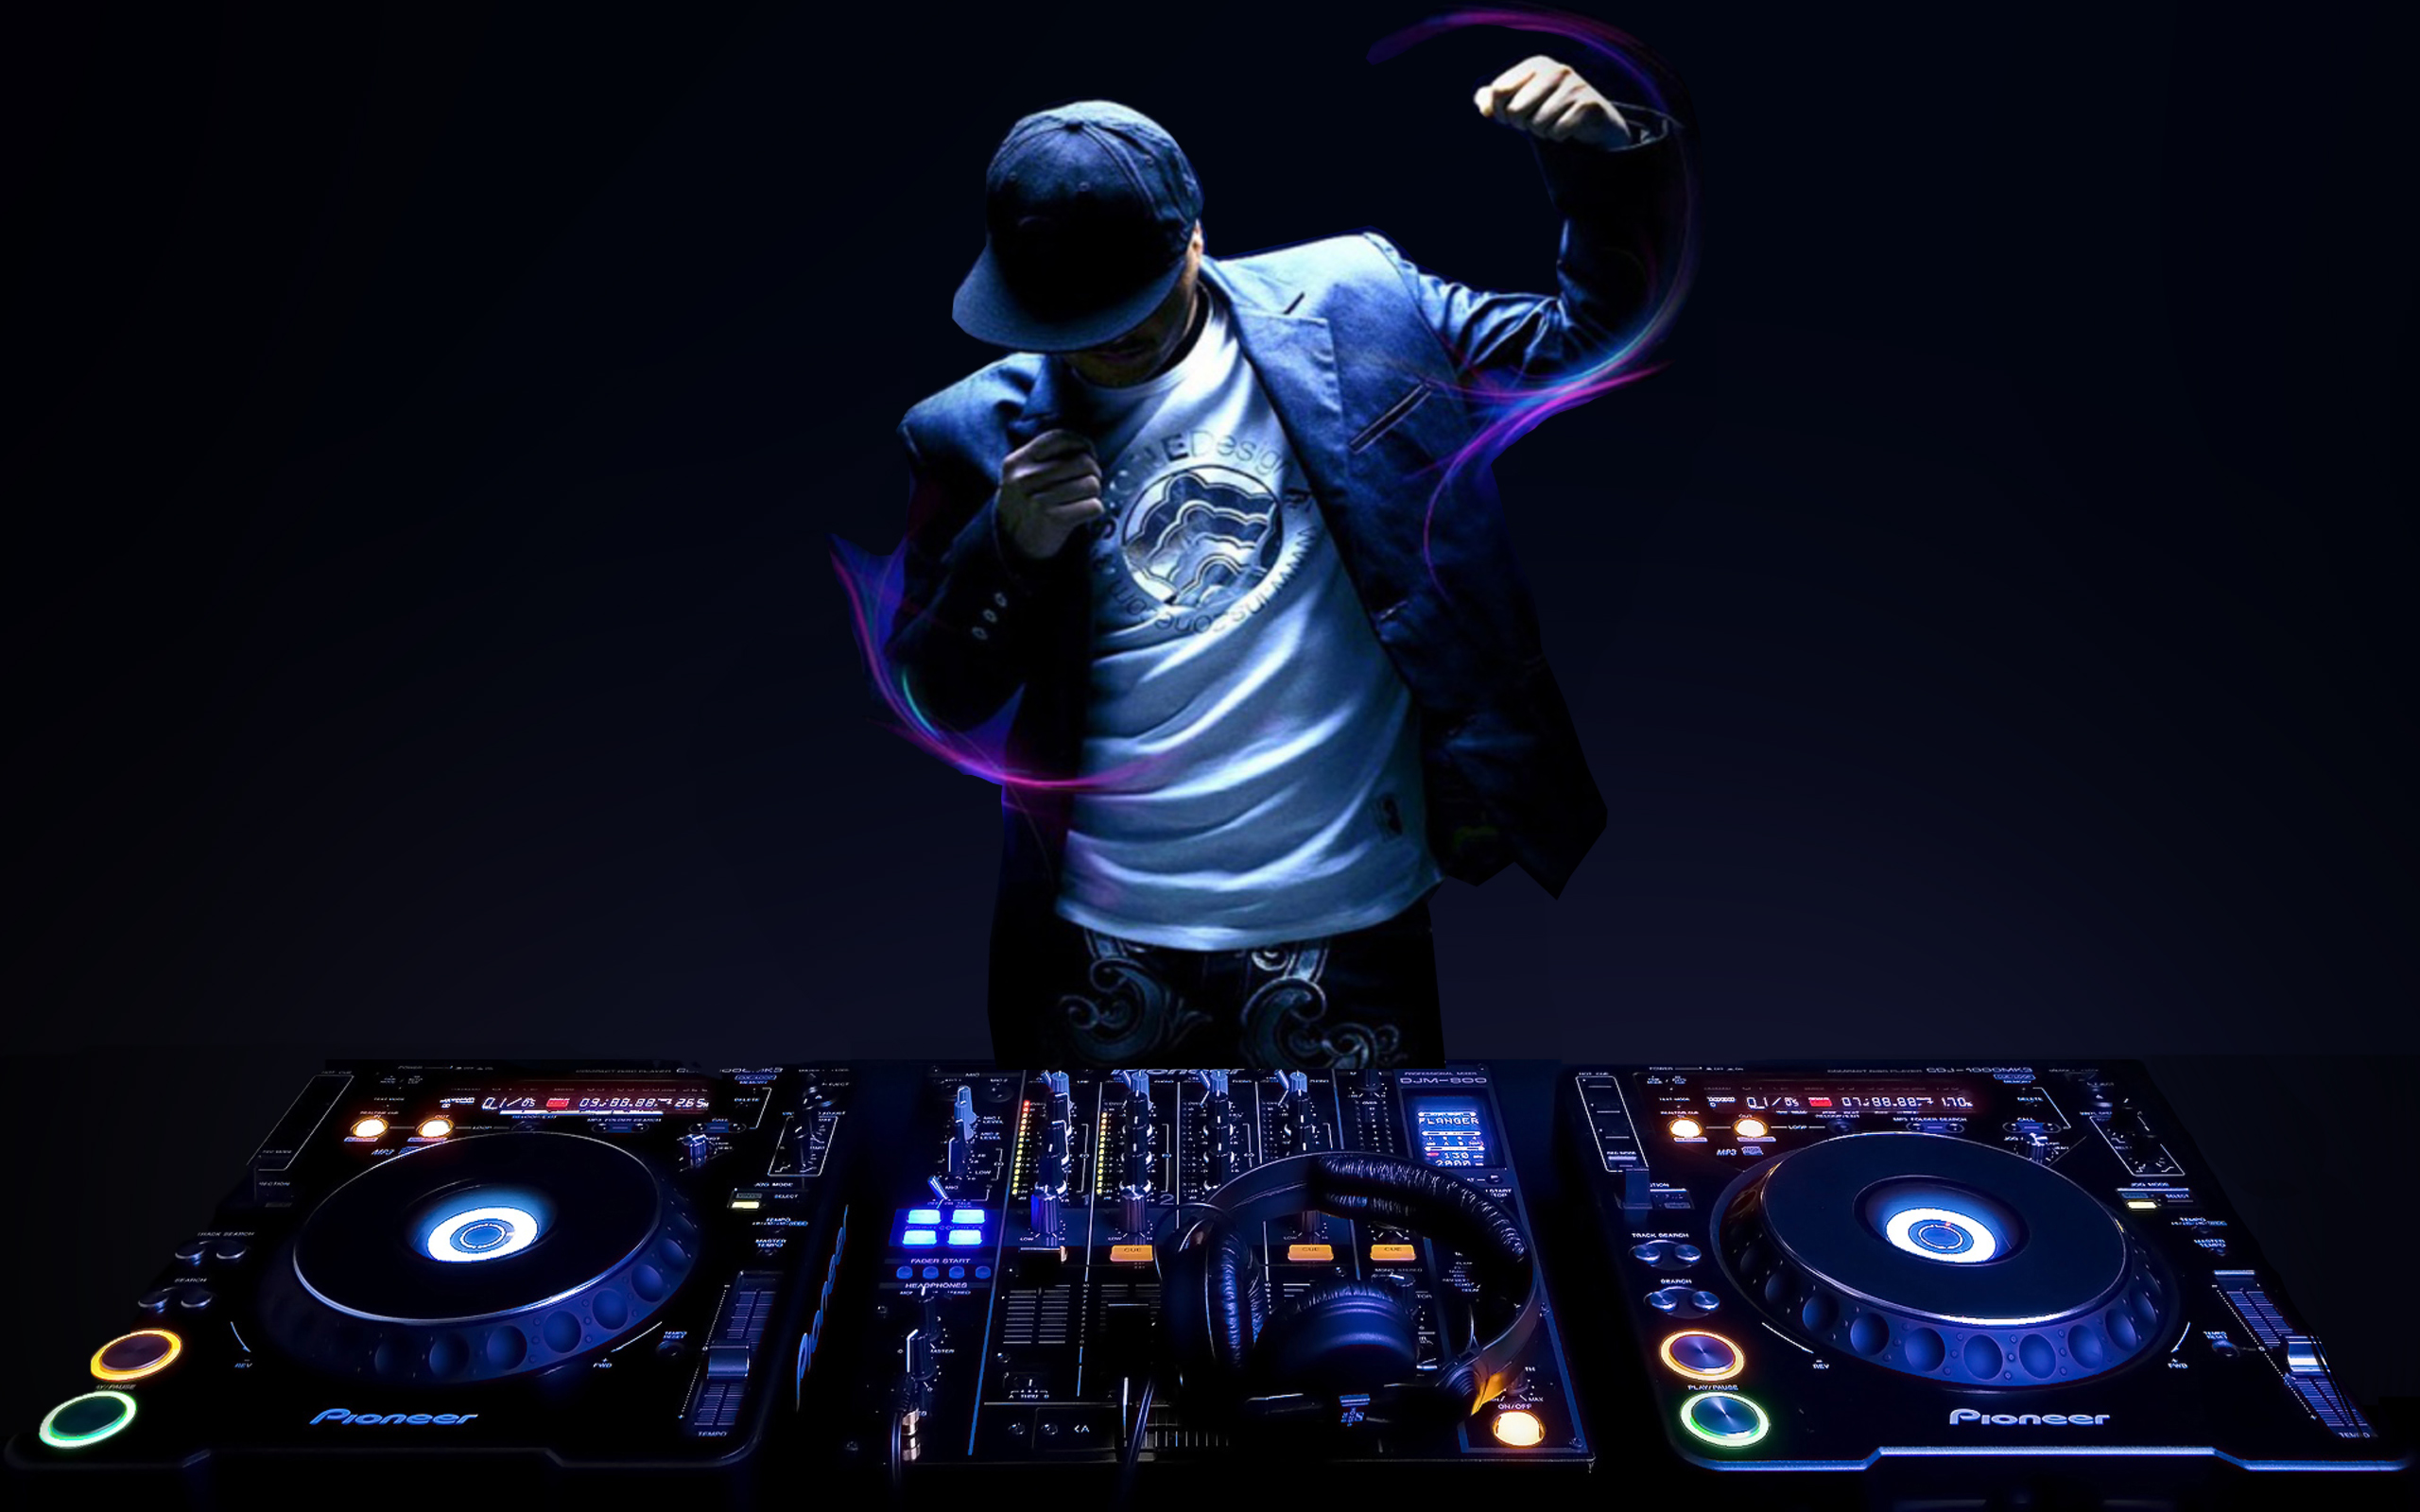 49+] DJ Wallpaper Download Free on WallpaperSafari